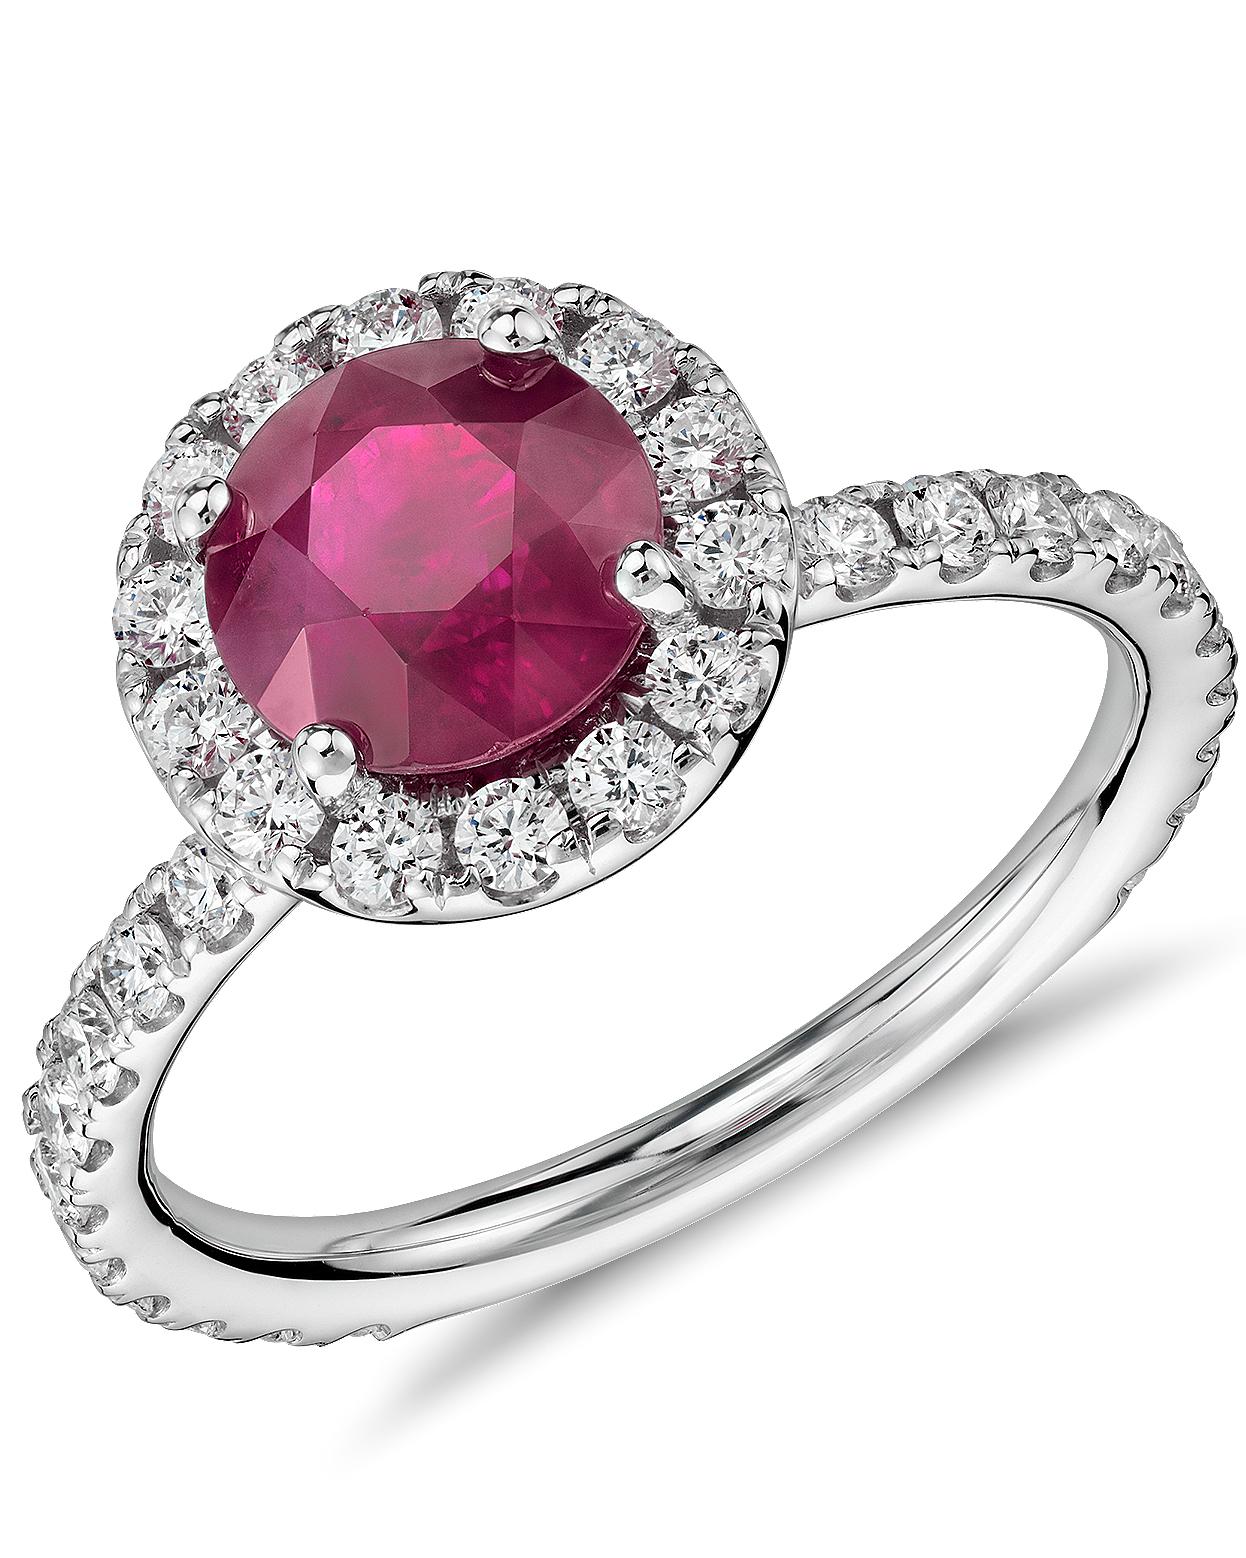 blue-nile-ruby-engagement-ring-diamond-pave-halo-0816.jpg